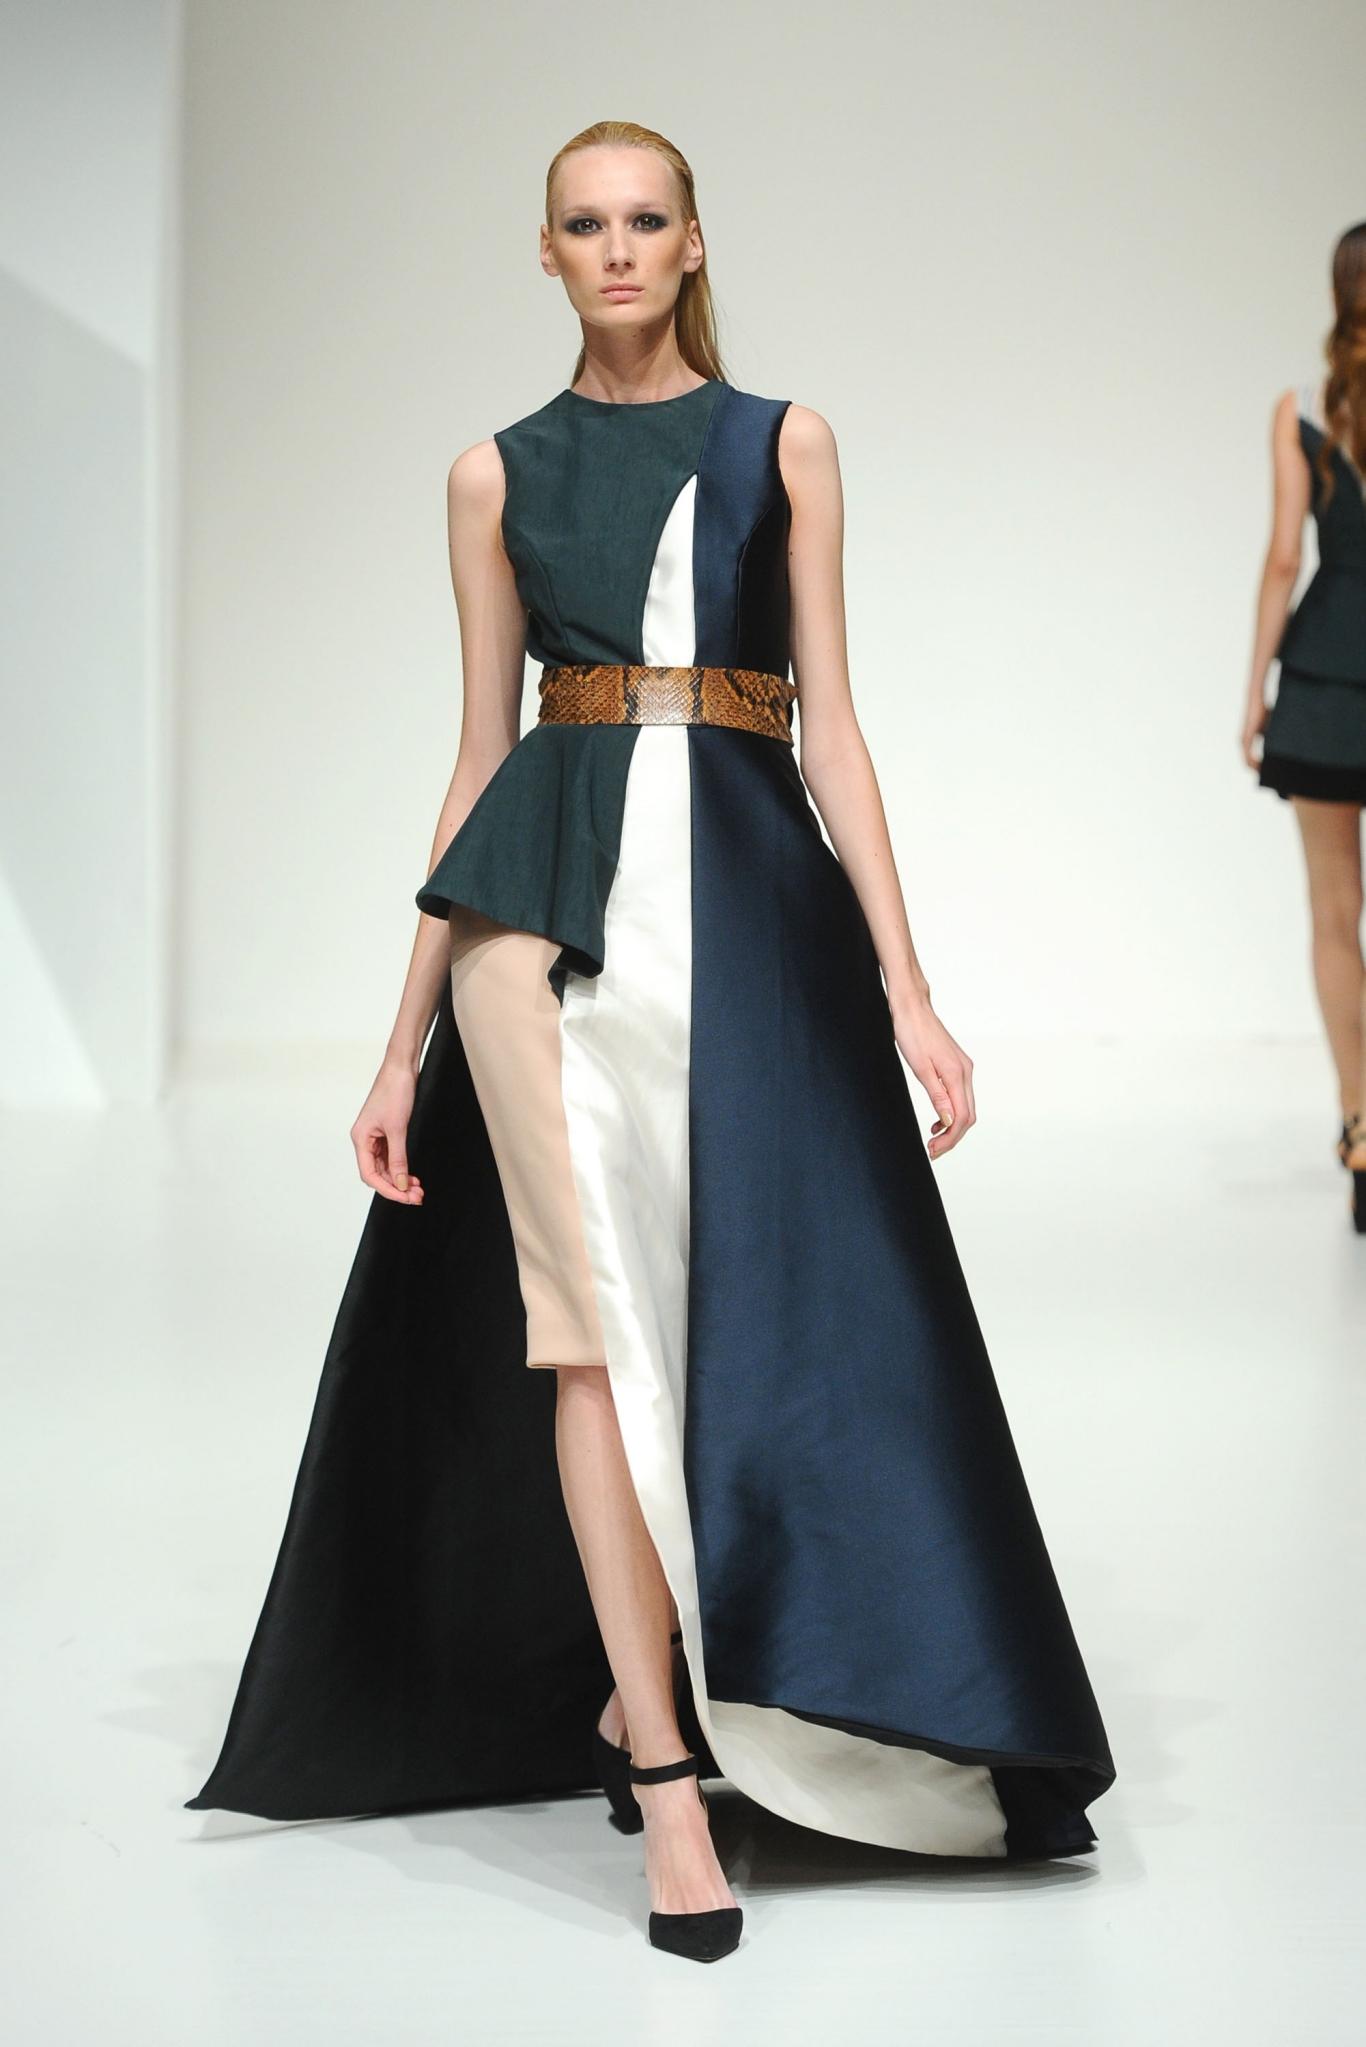 Hussein Bazaza at Fashion Forward Season 5. Dubai, United Arab Emirates